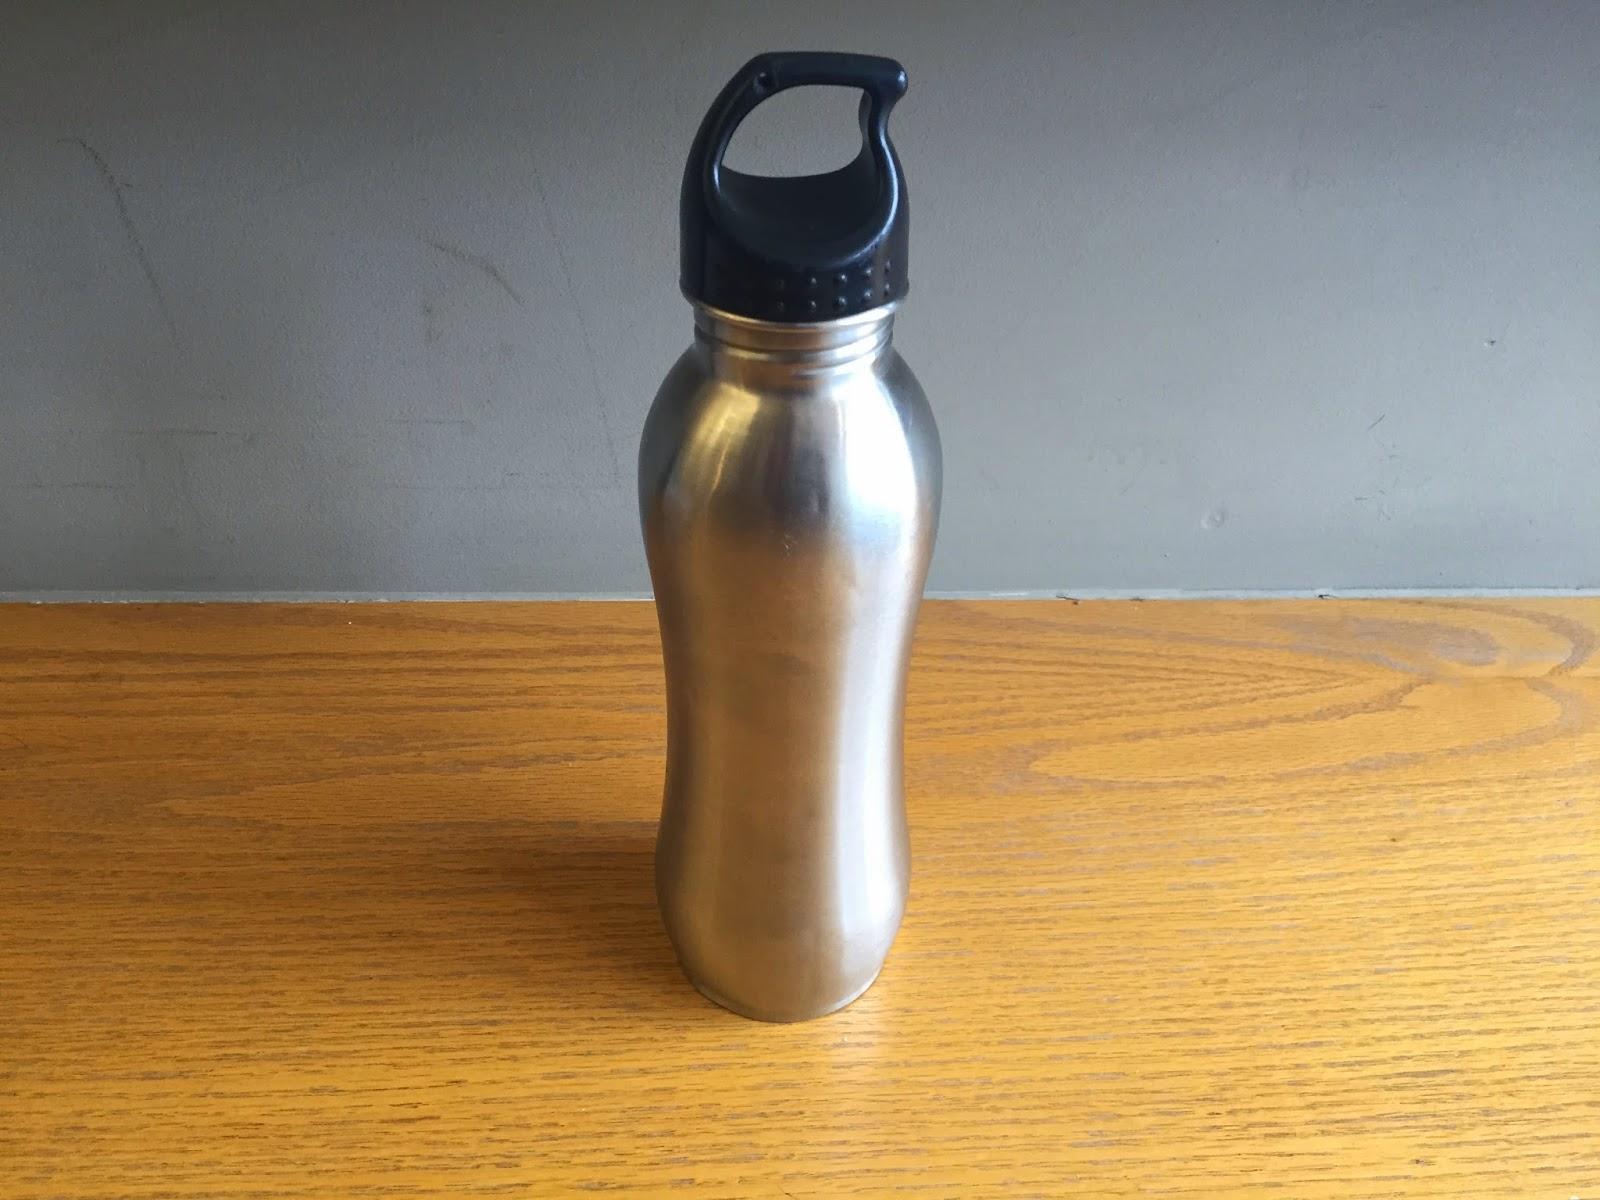 Stainless steel metal water bottle appliance recycling